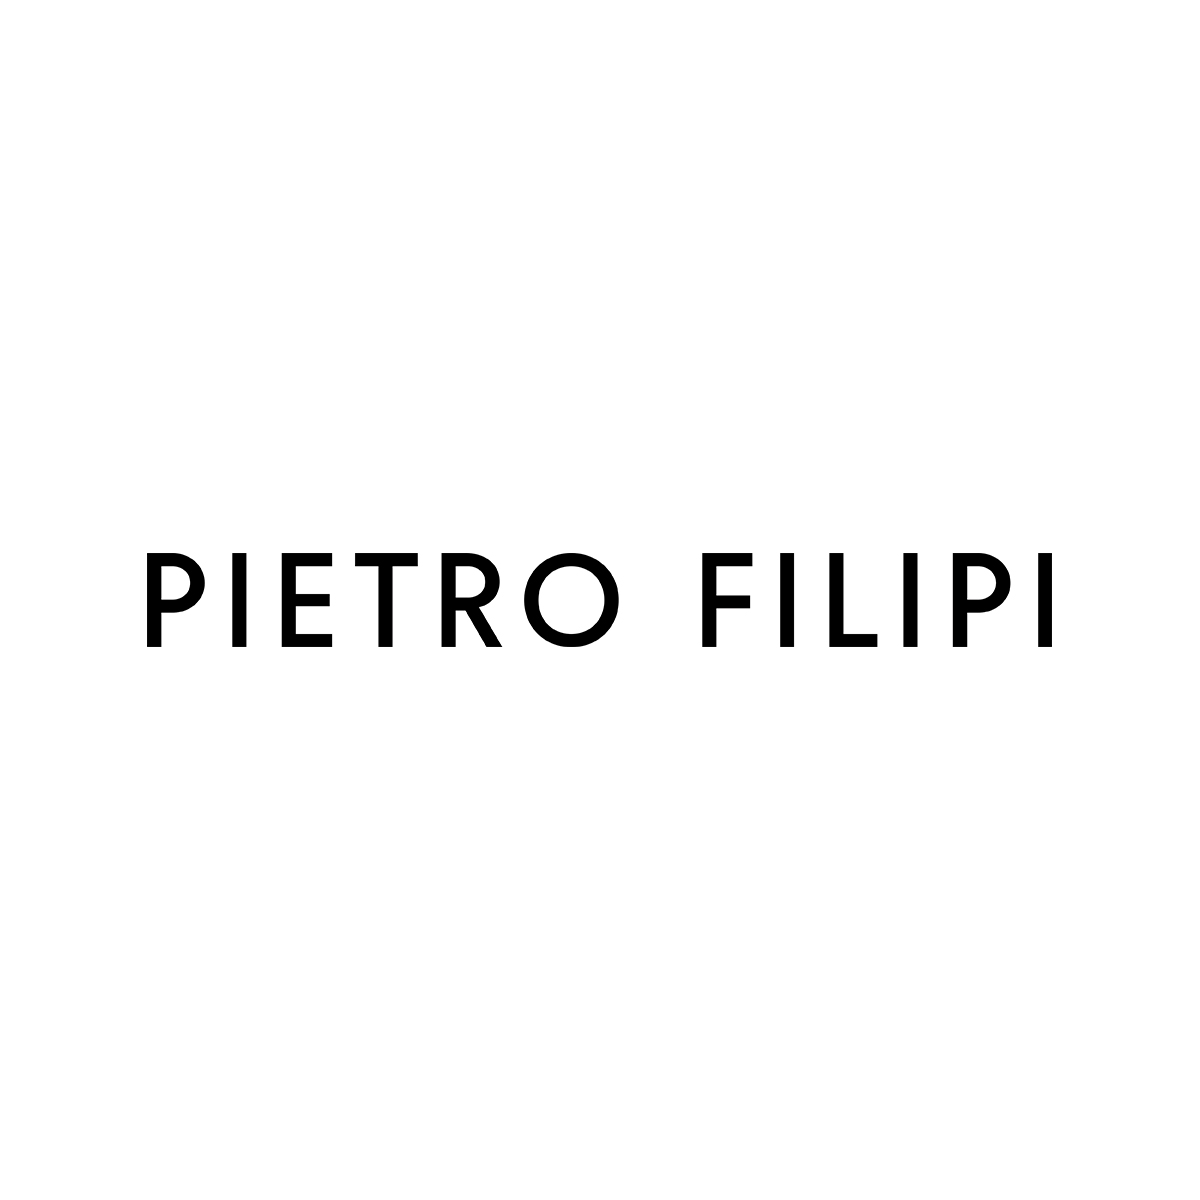 Pietro Filipi logo